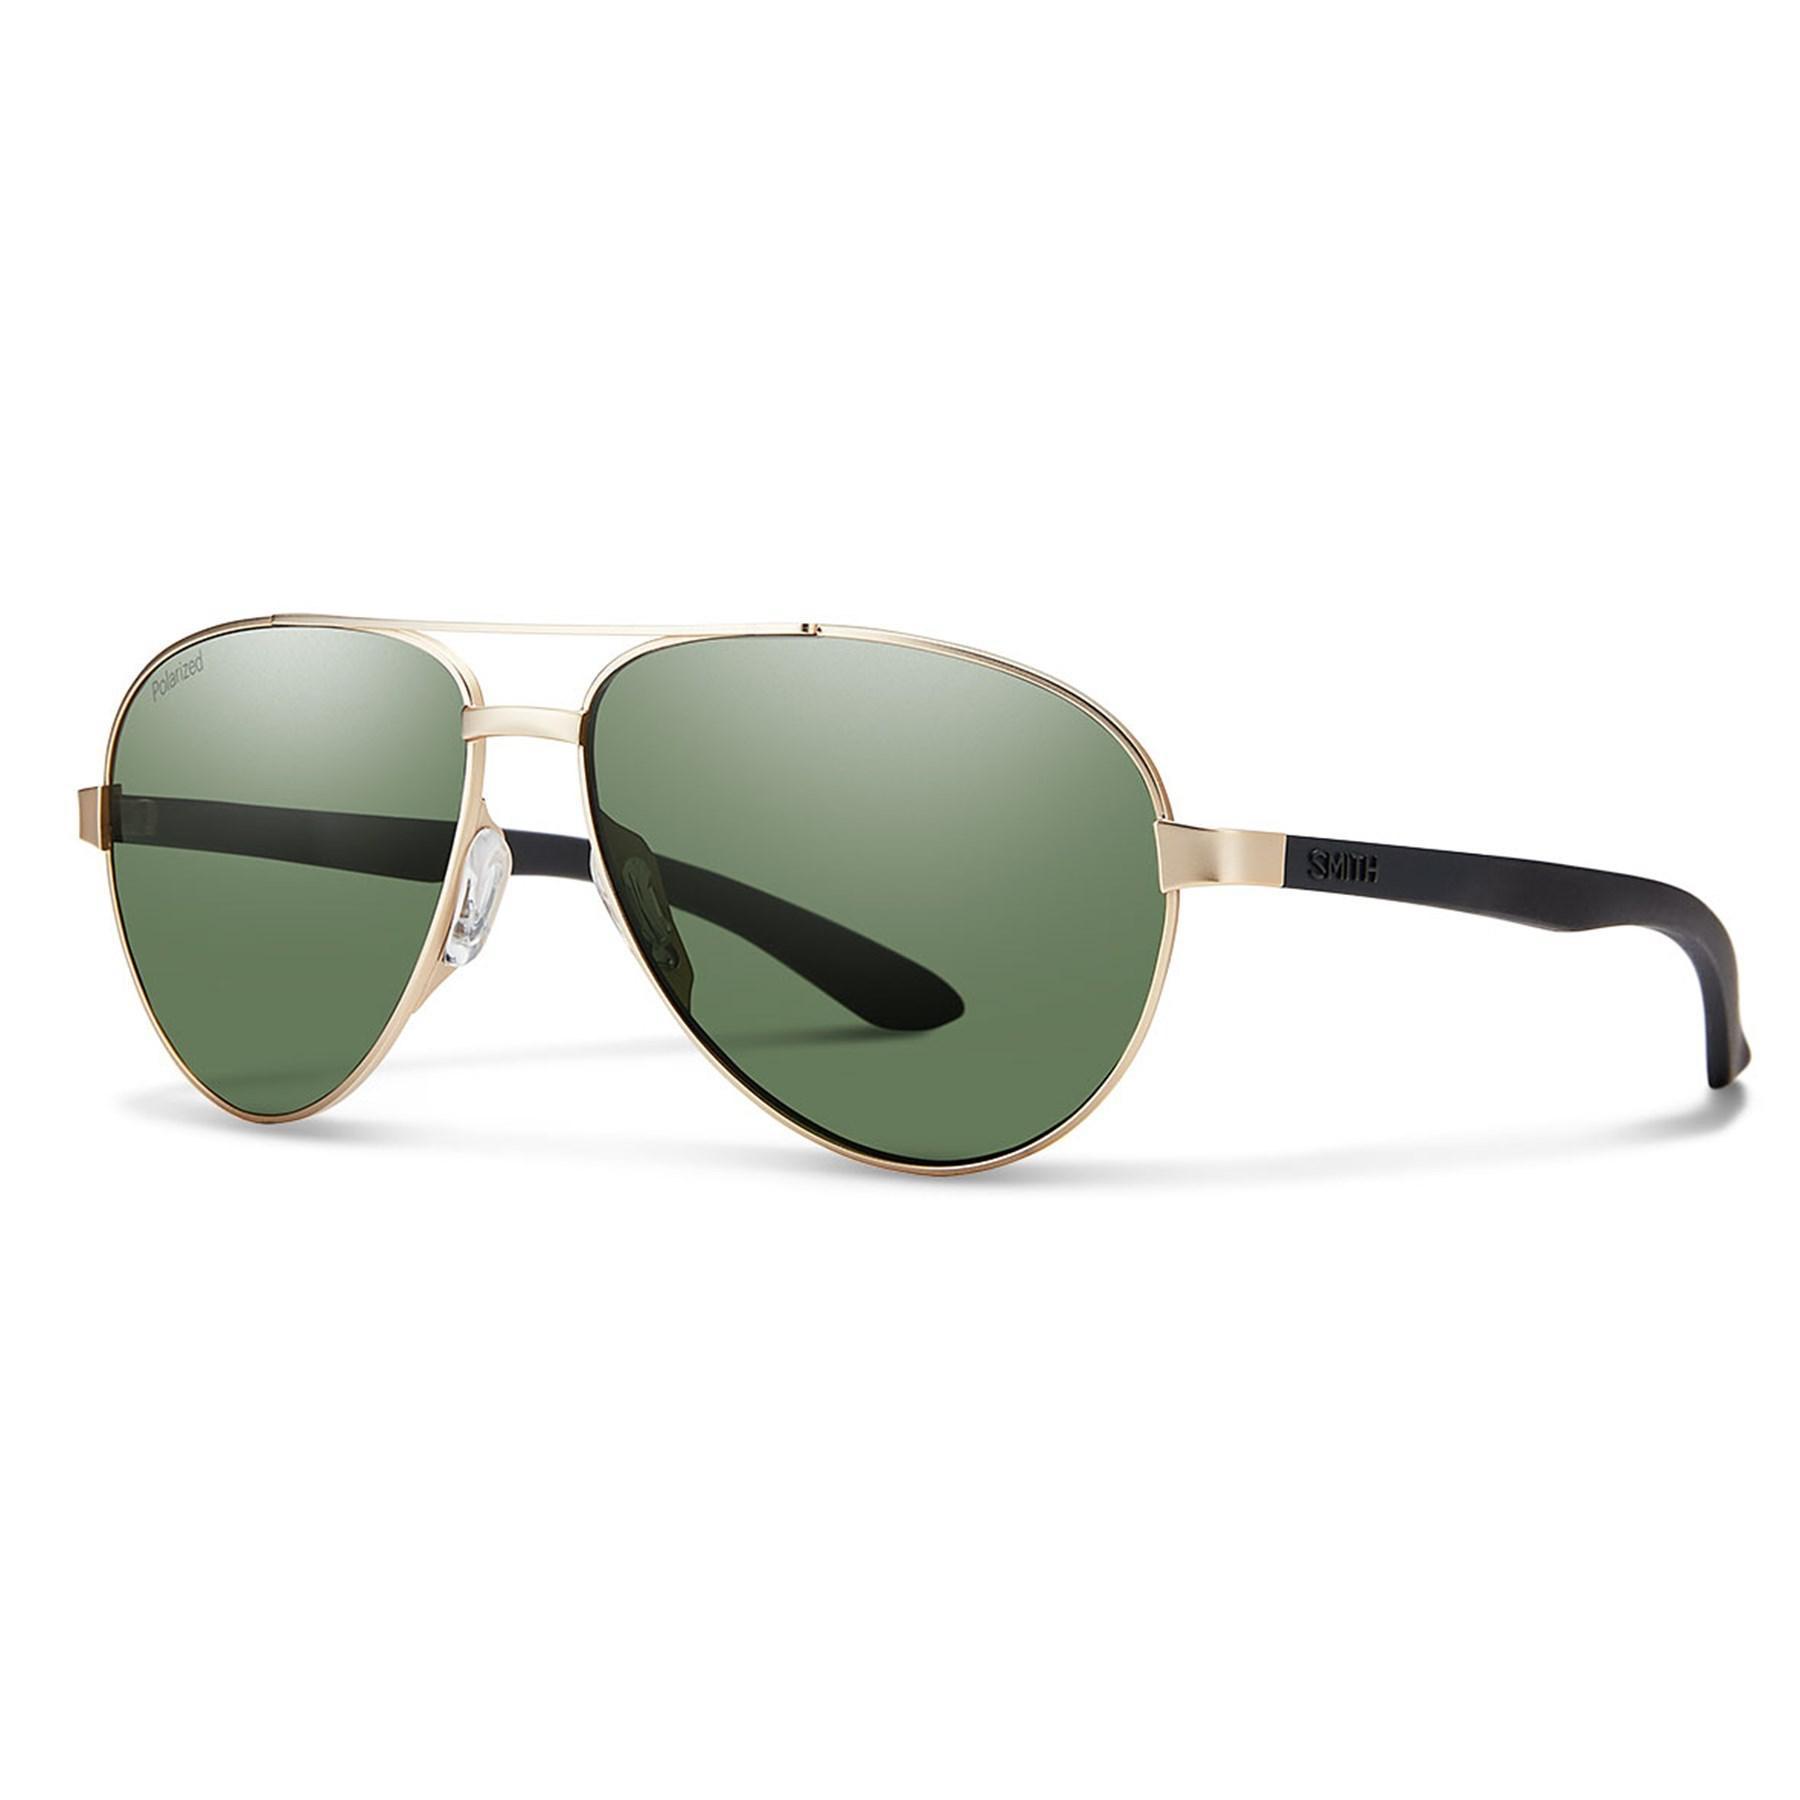 7023ef74cc6 Lyst - Smith Optics Salute Sunglasses in Green